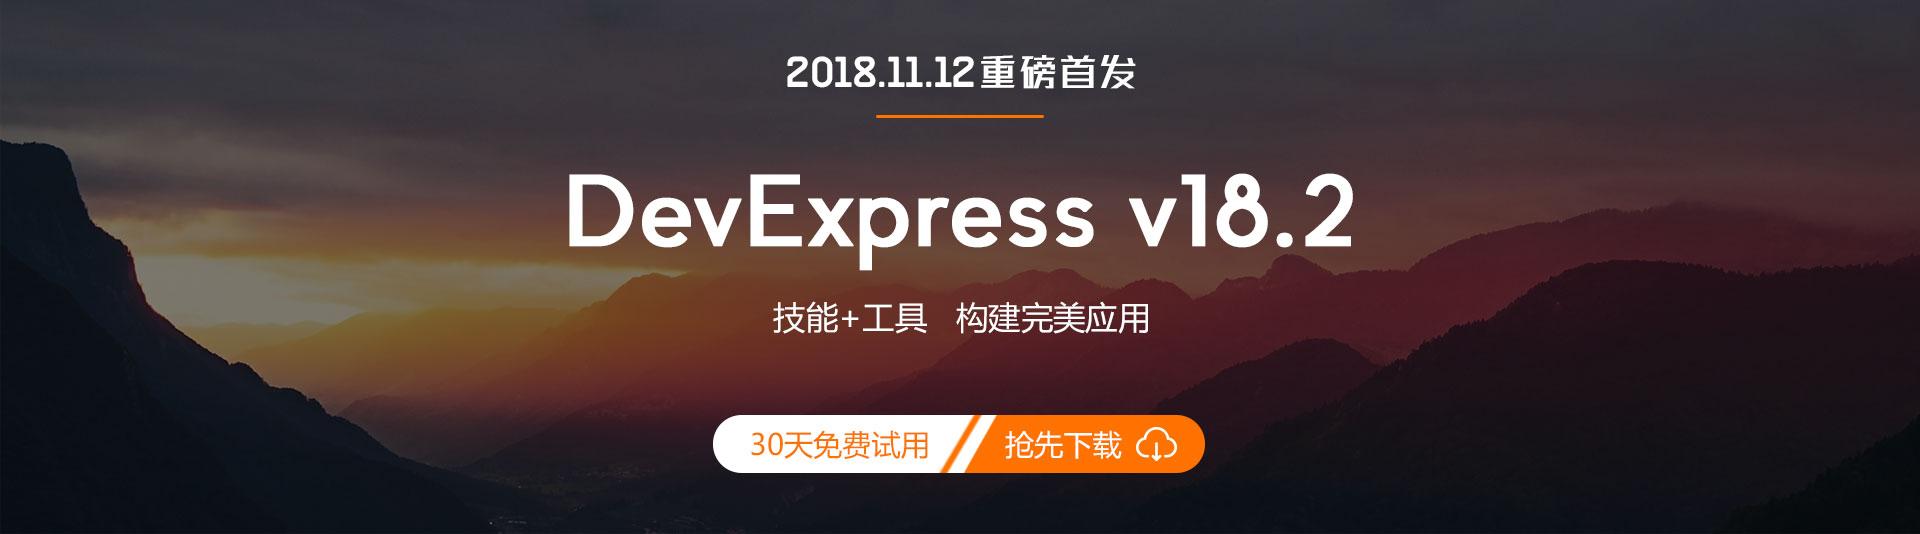 DevExpress v18.2全新发布